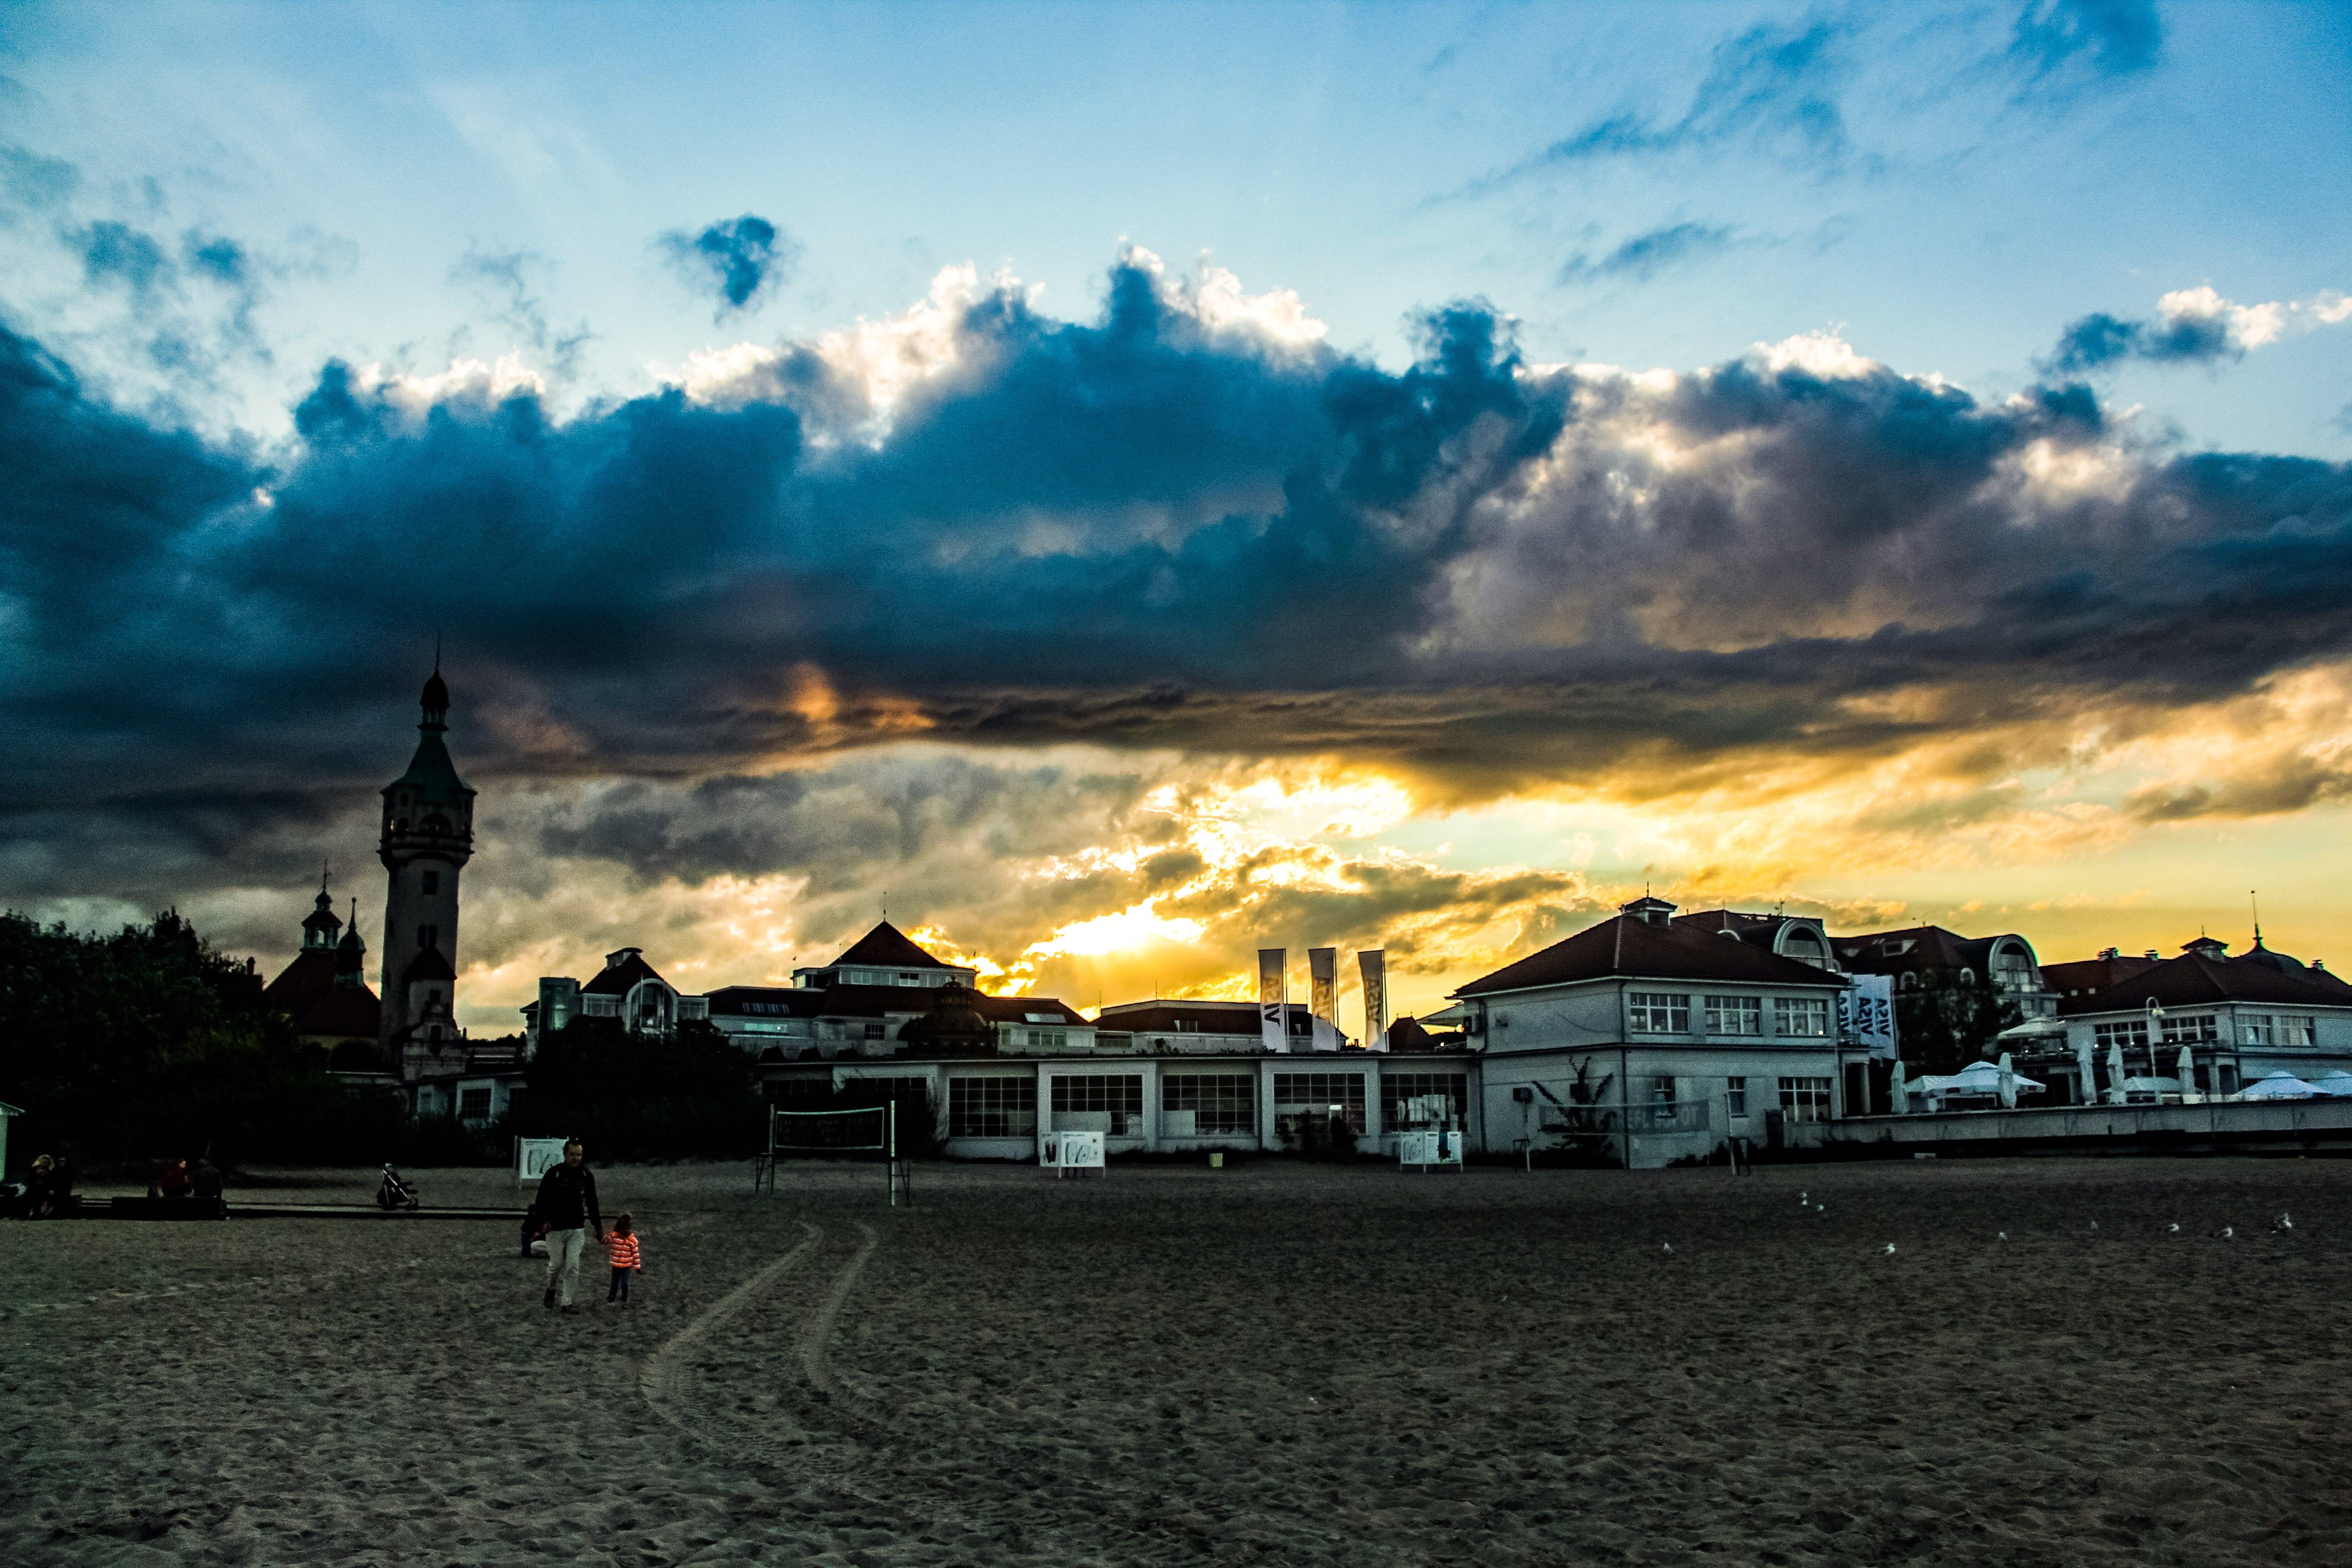 Fotos de stock gratuitas de amanecer, arena, arquitectura, cielo